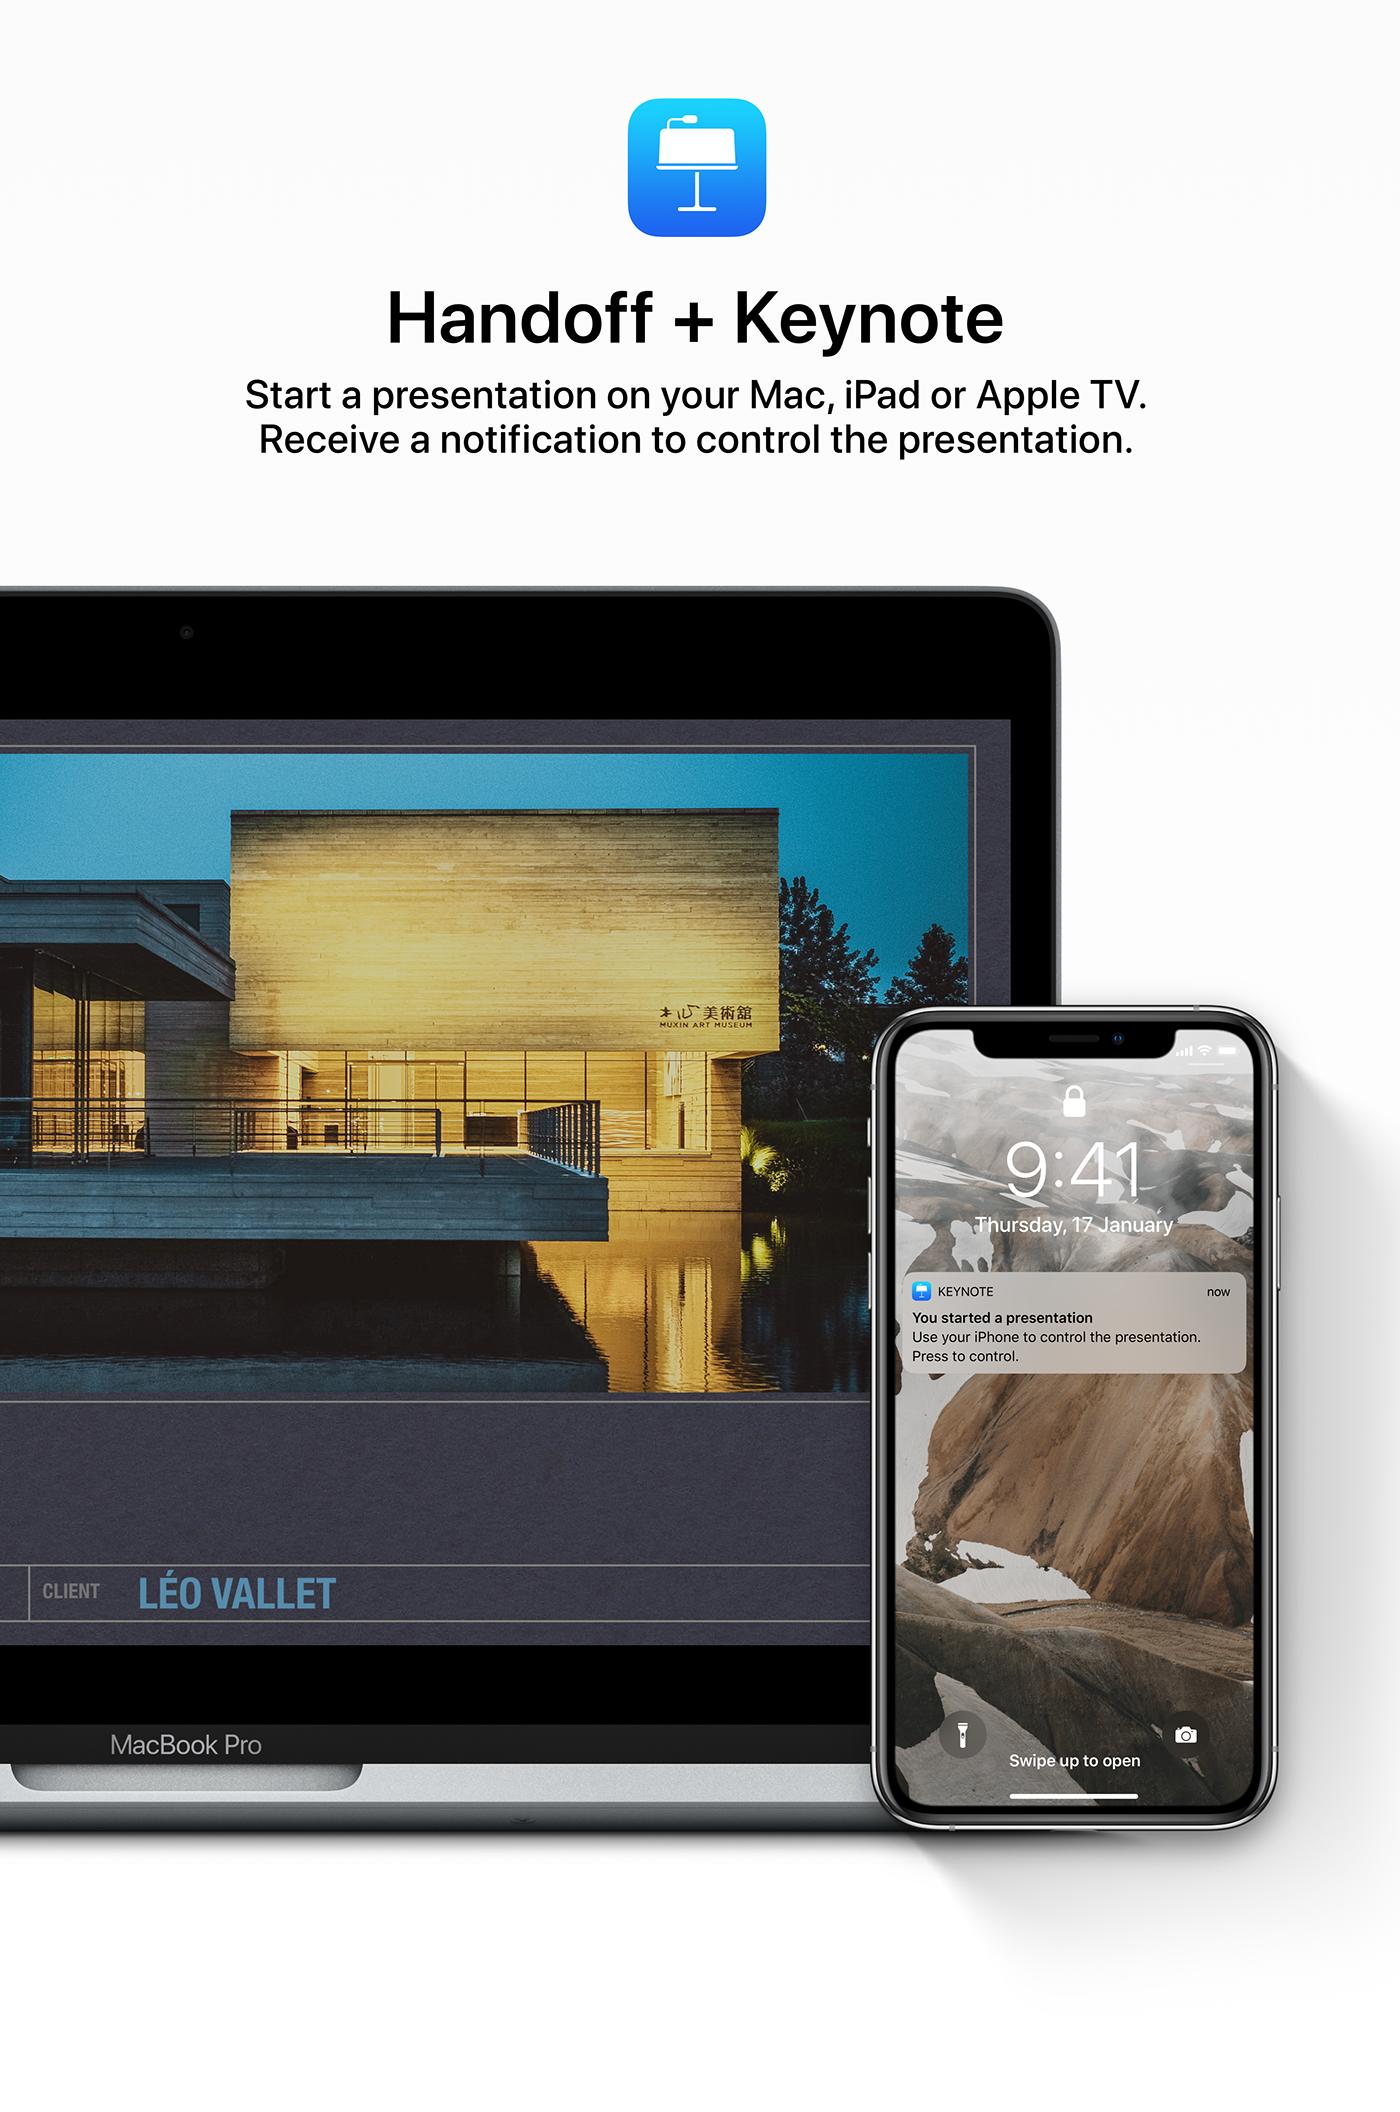 iOS 13 concept handoff